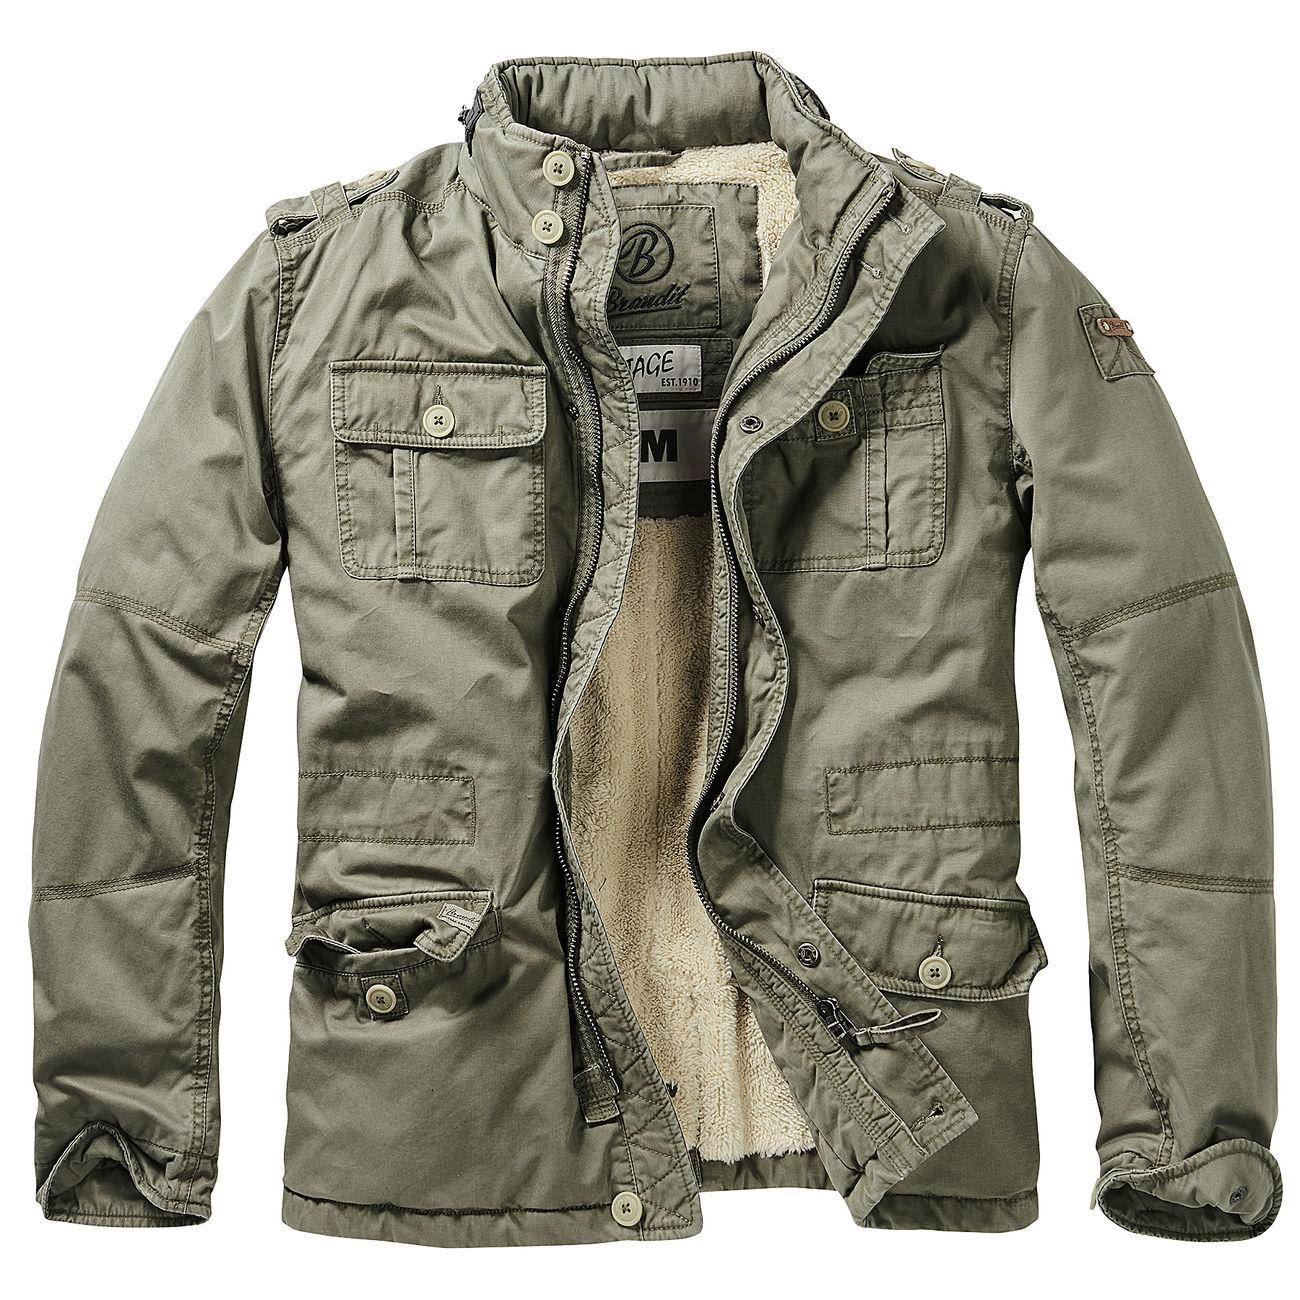 52da007d4518 Original M65 Jacken kaufen - Kotte   Zeller Army Shop